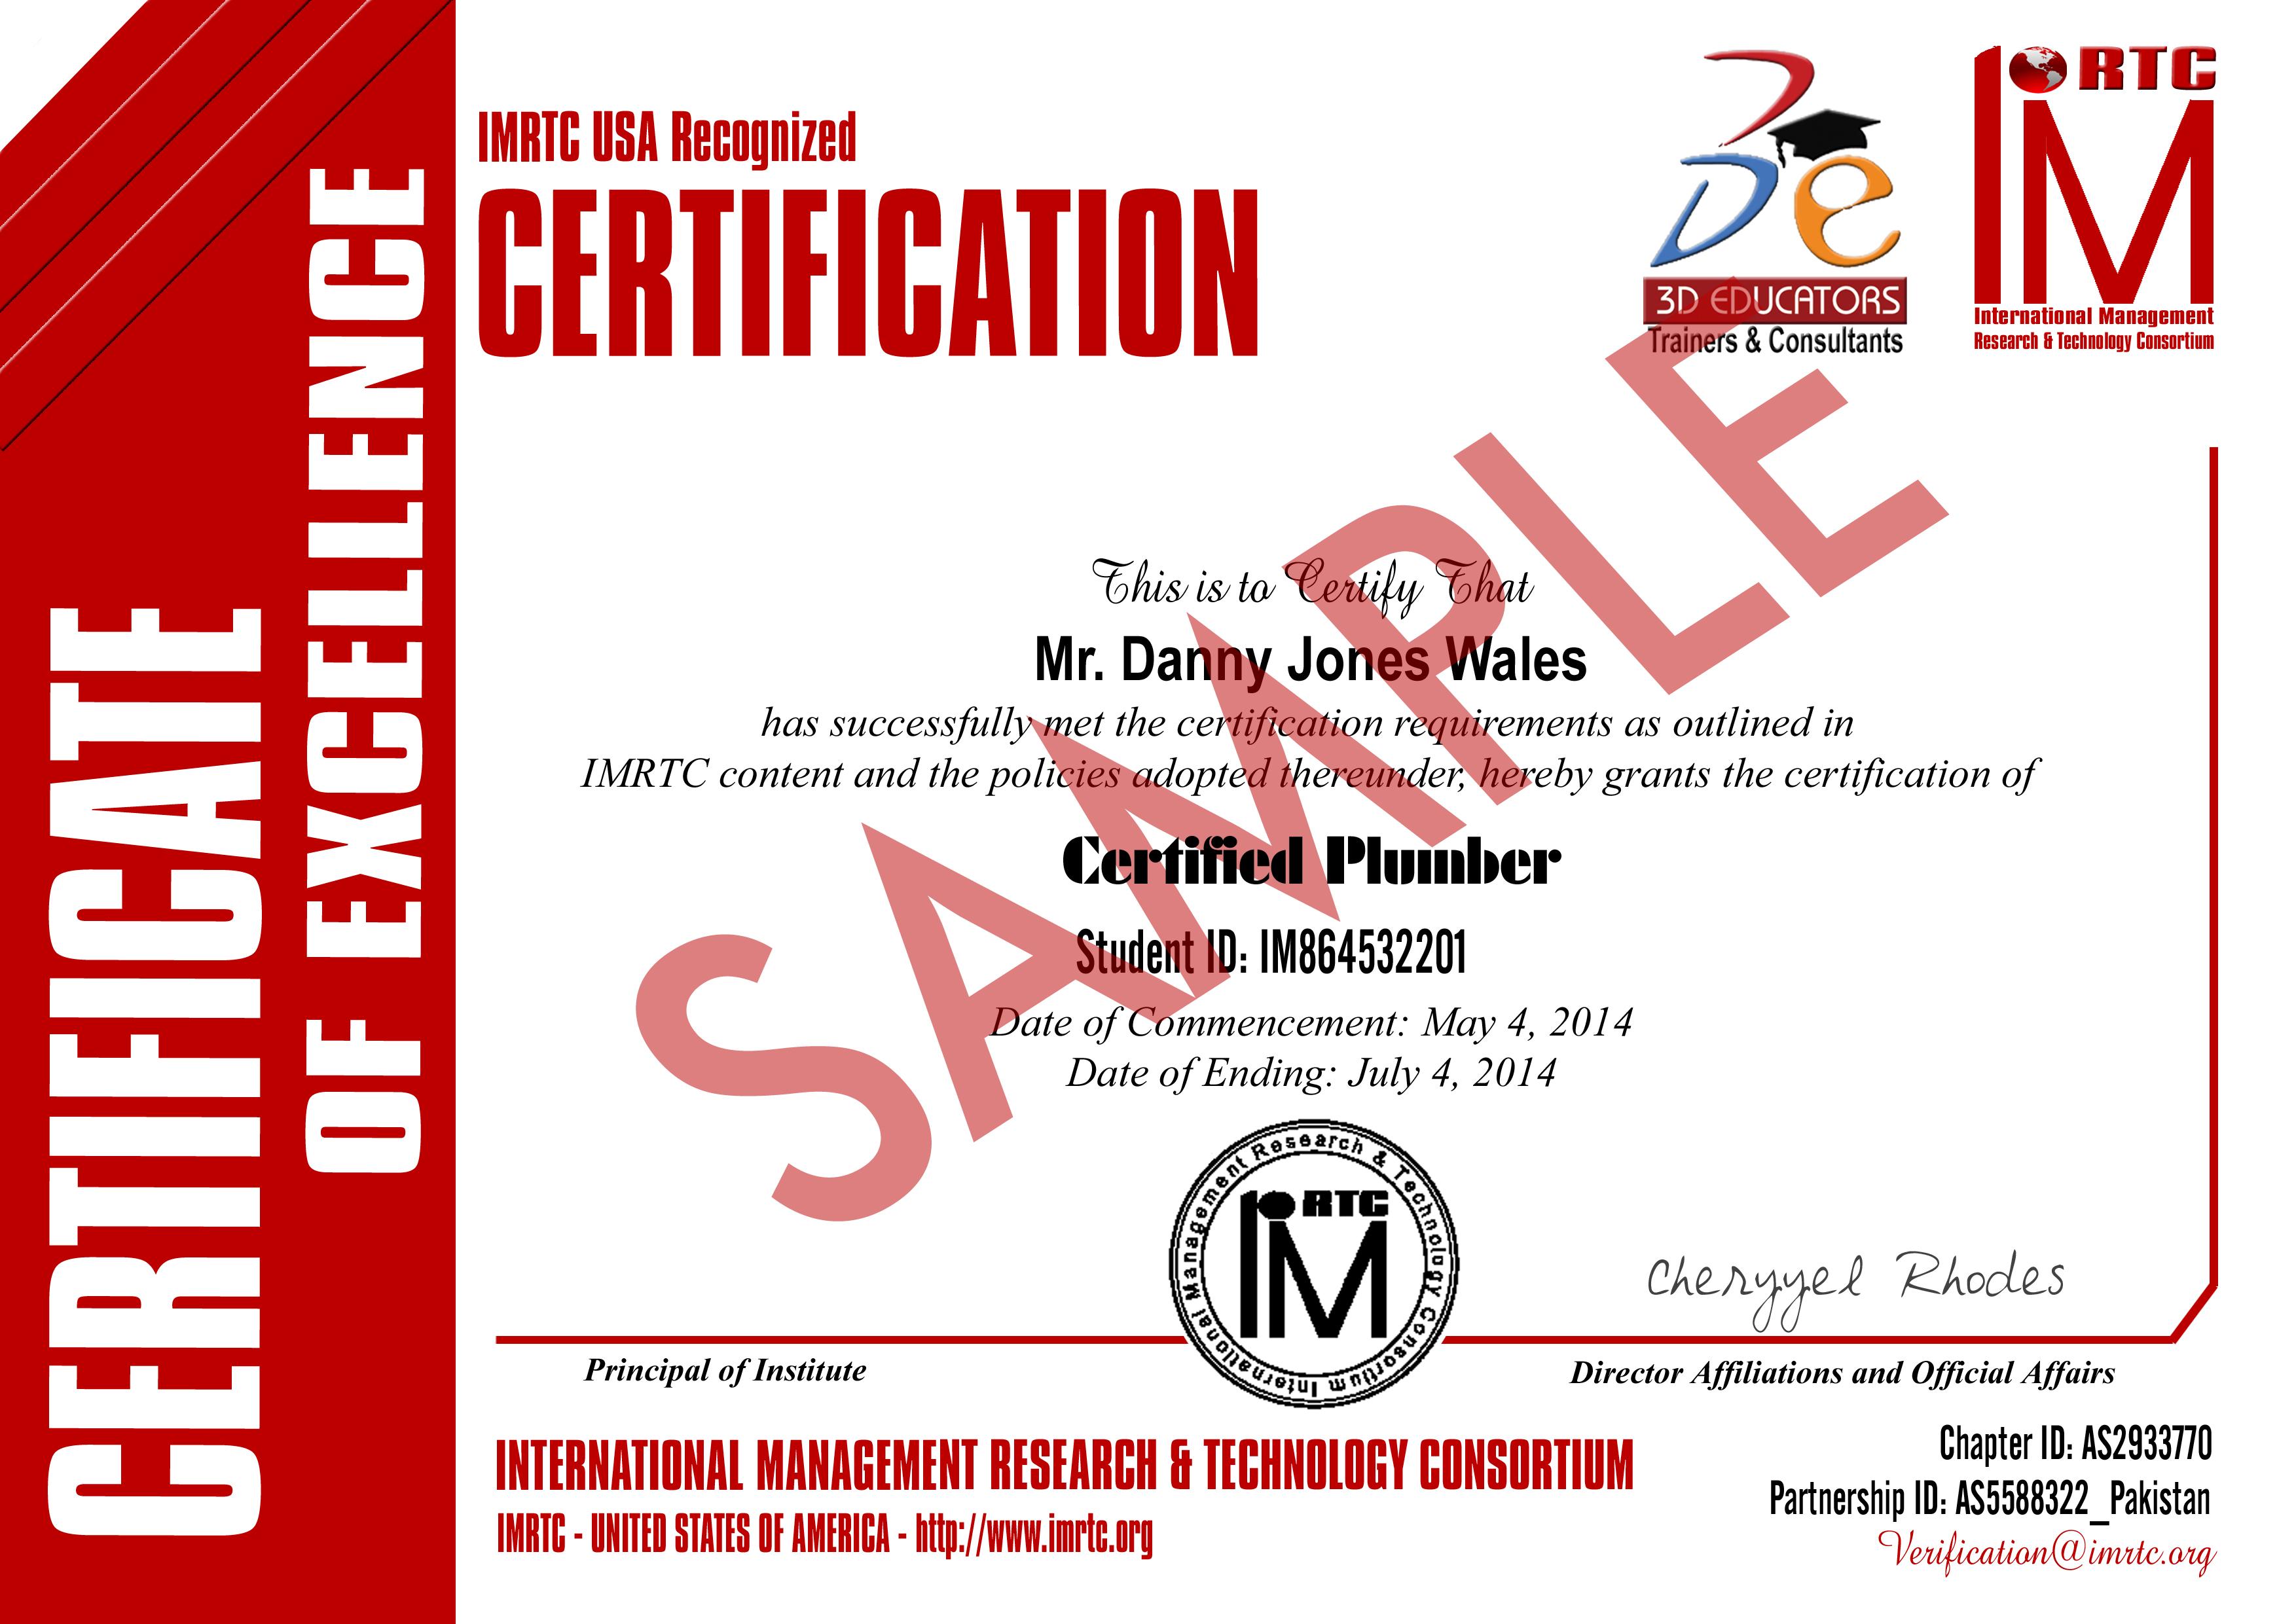 Certified Plumber Vocational Training Course In Karachi Pakistan